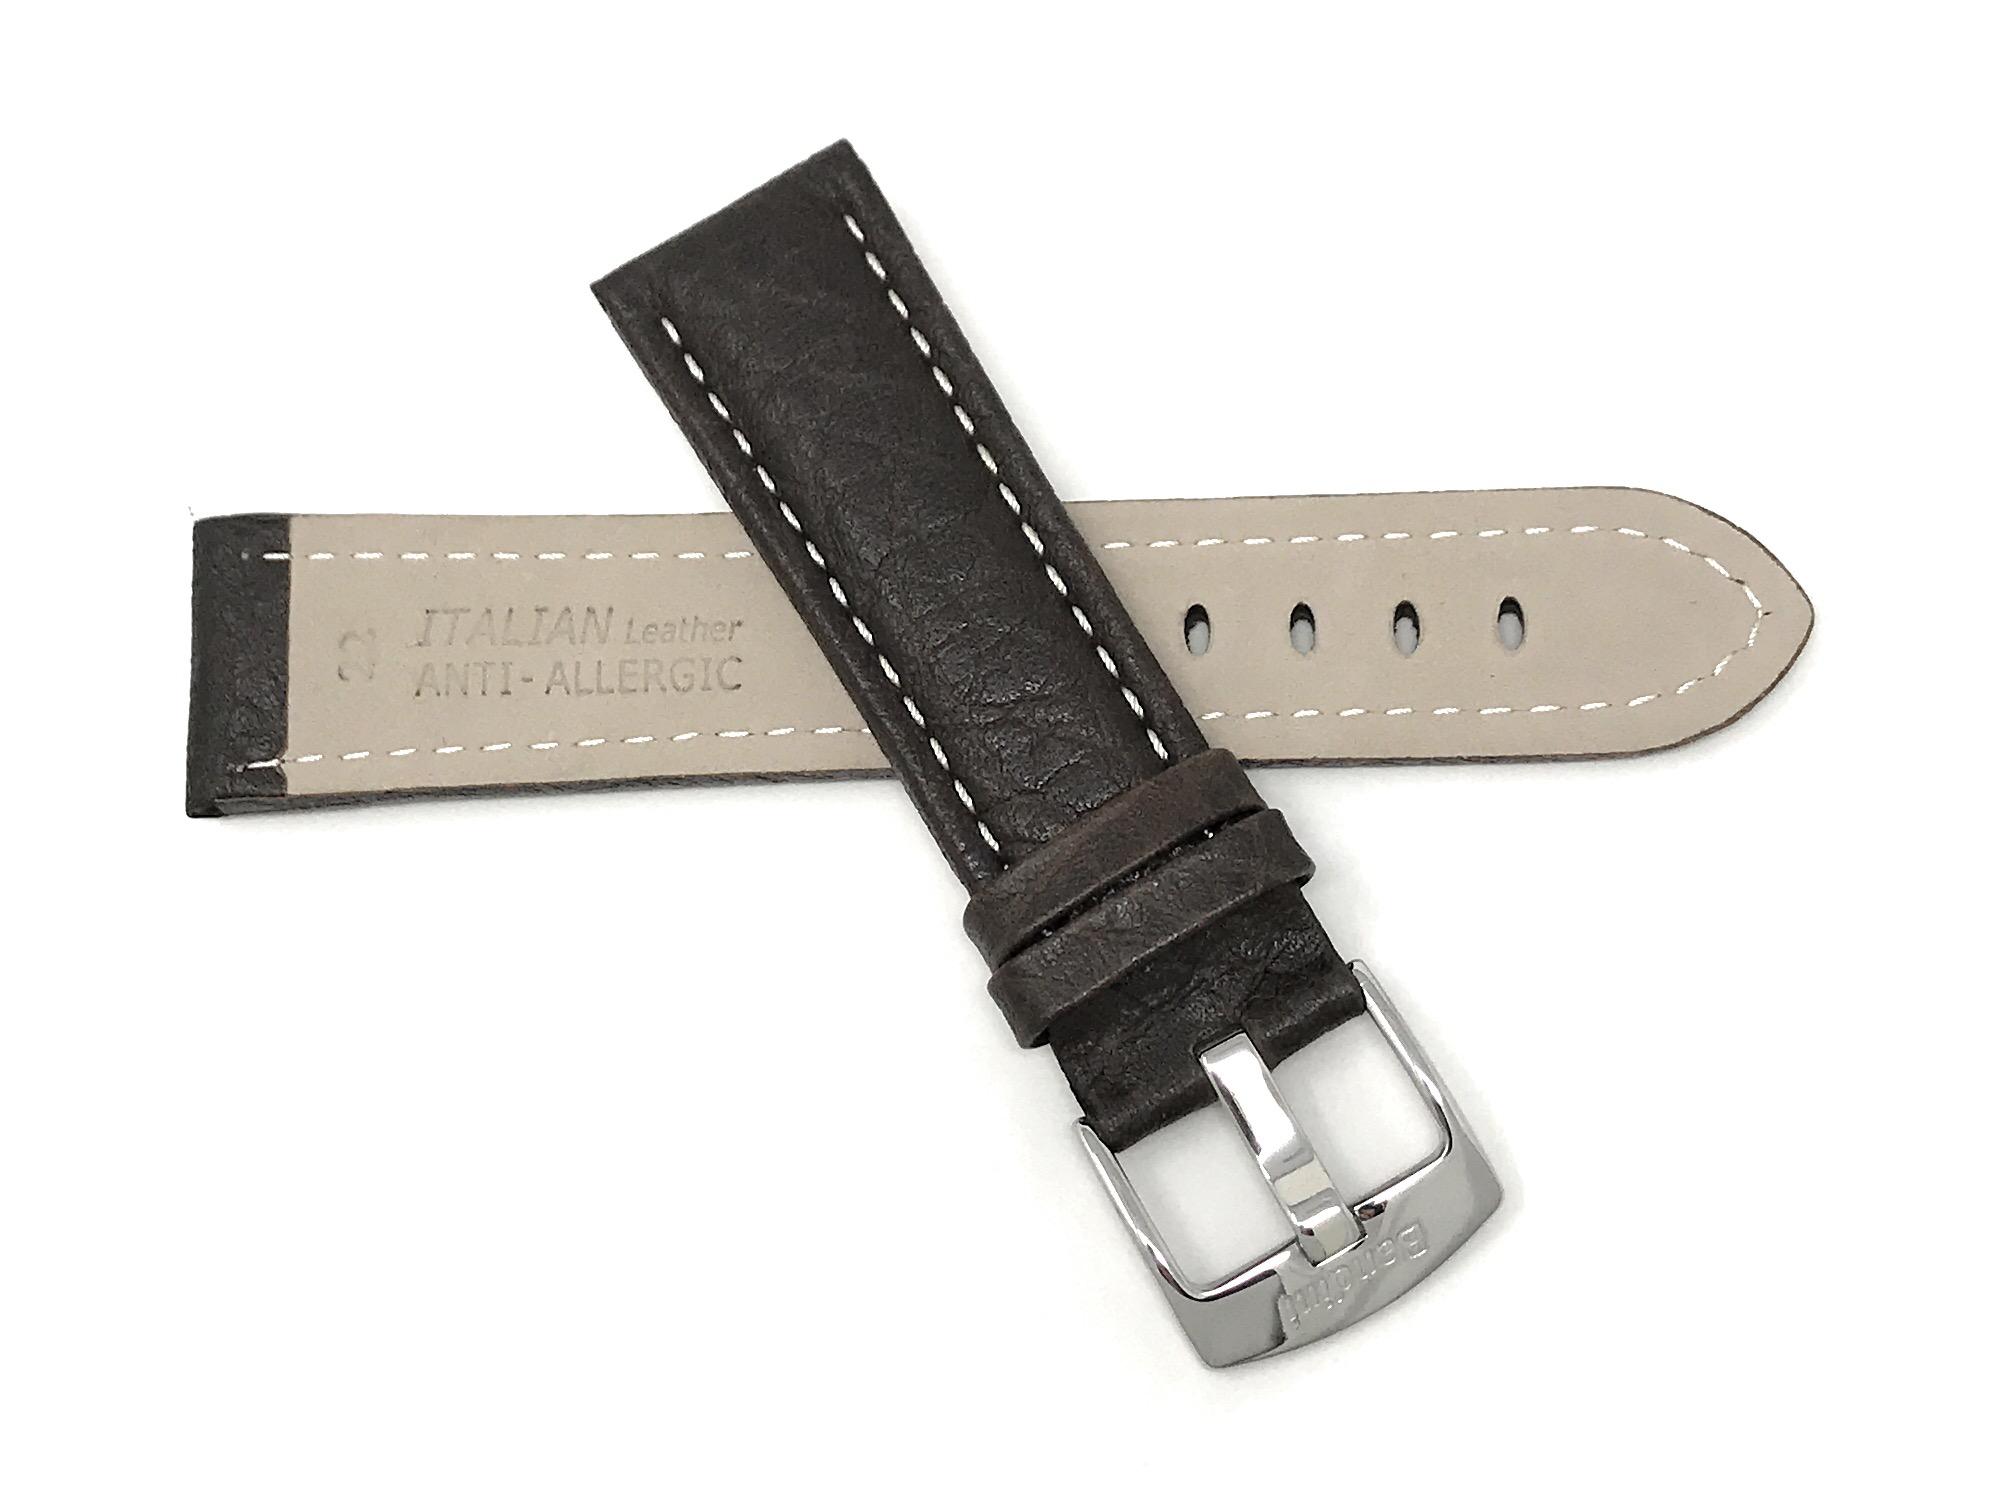 Bandini-Watch-Band-Leather-Strap-Buffalo-Pattern-18mm-30mm-Extra-Long-Also thumbnail 28